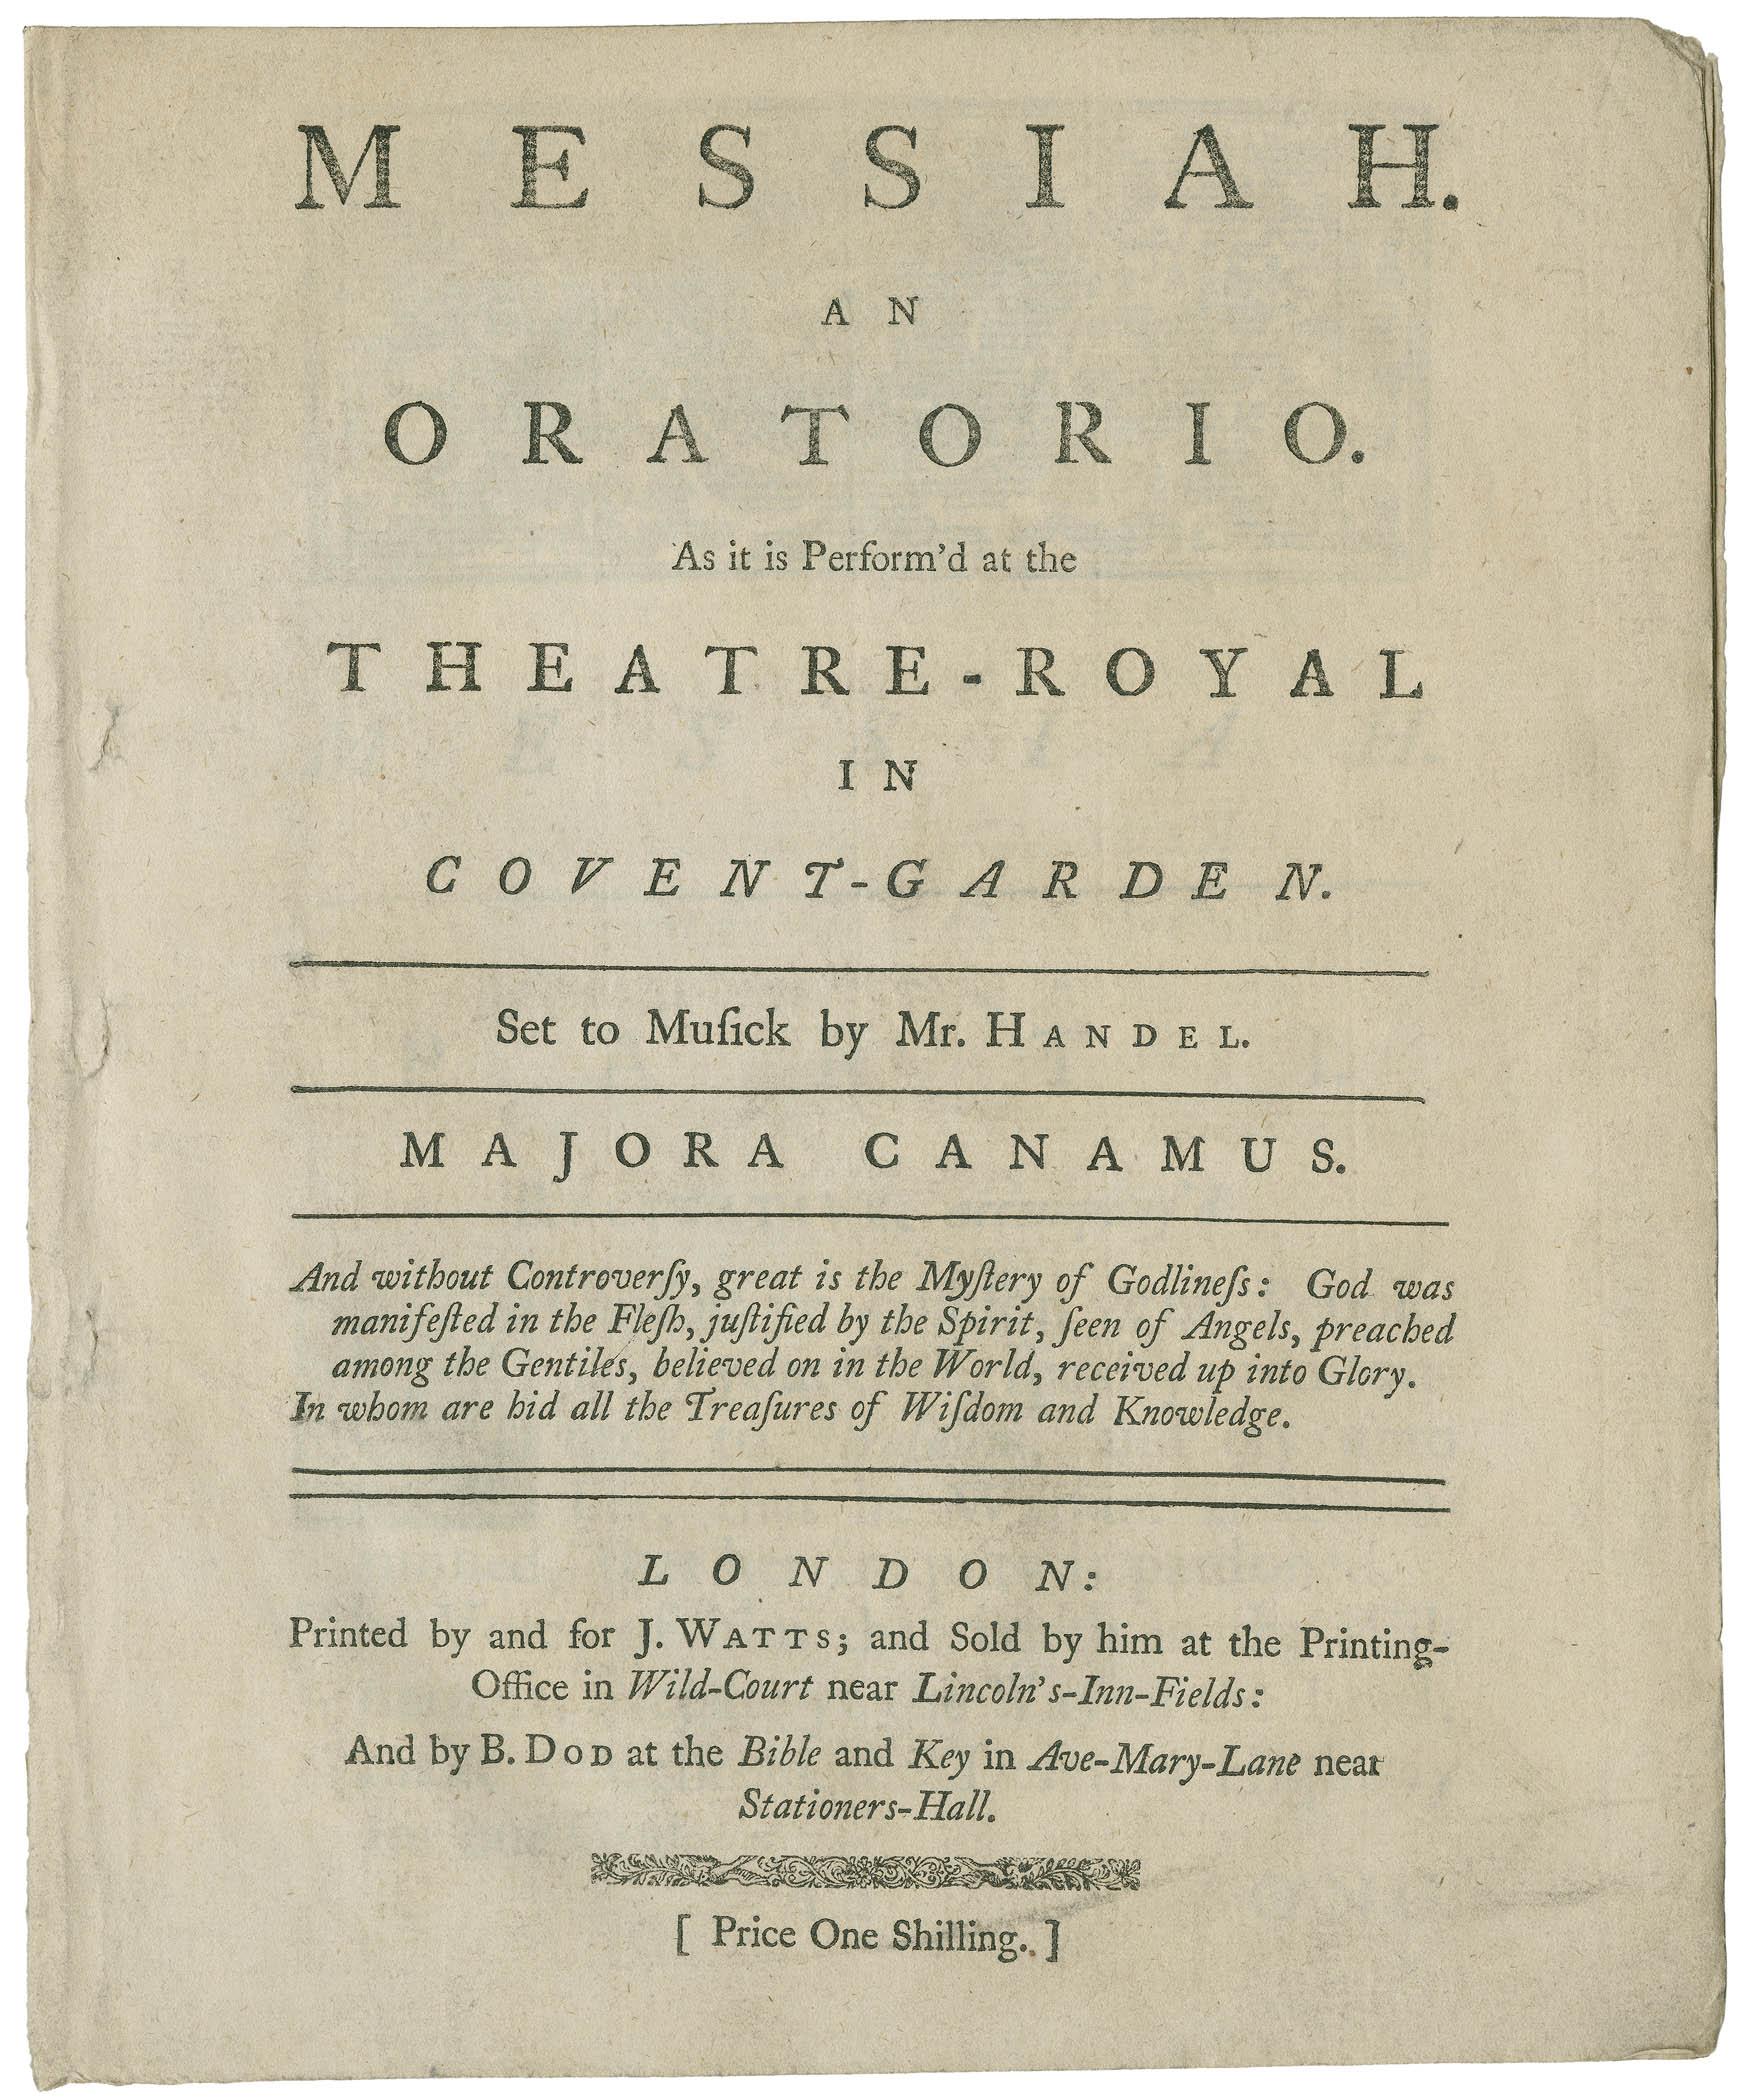 159- 150q, title page